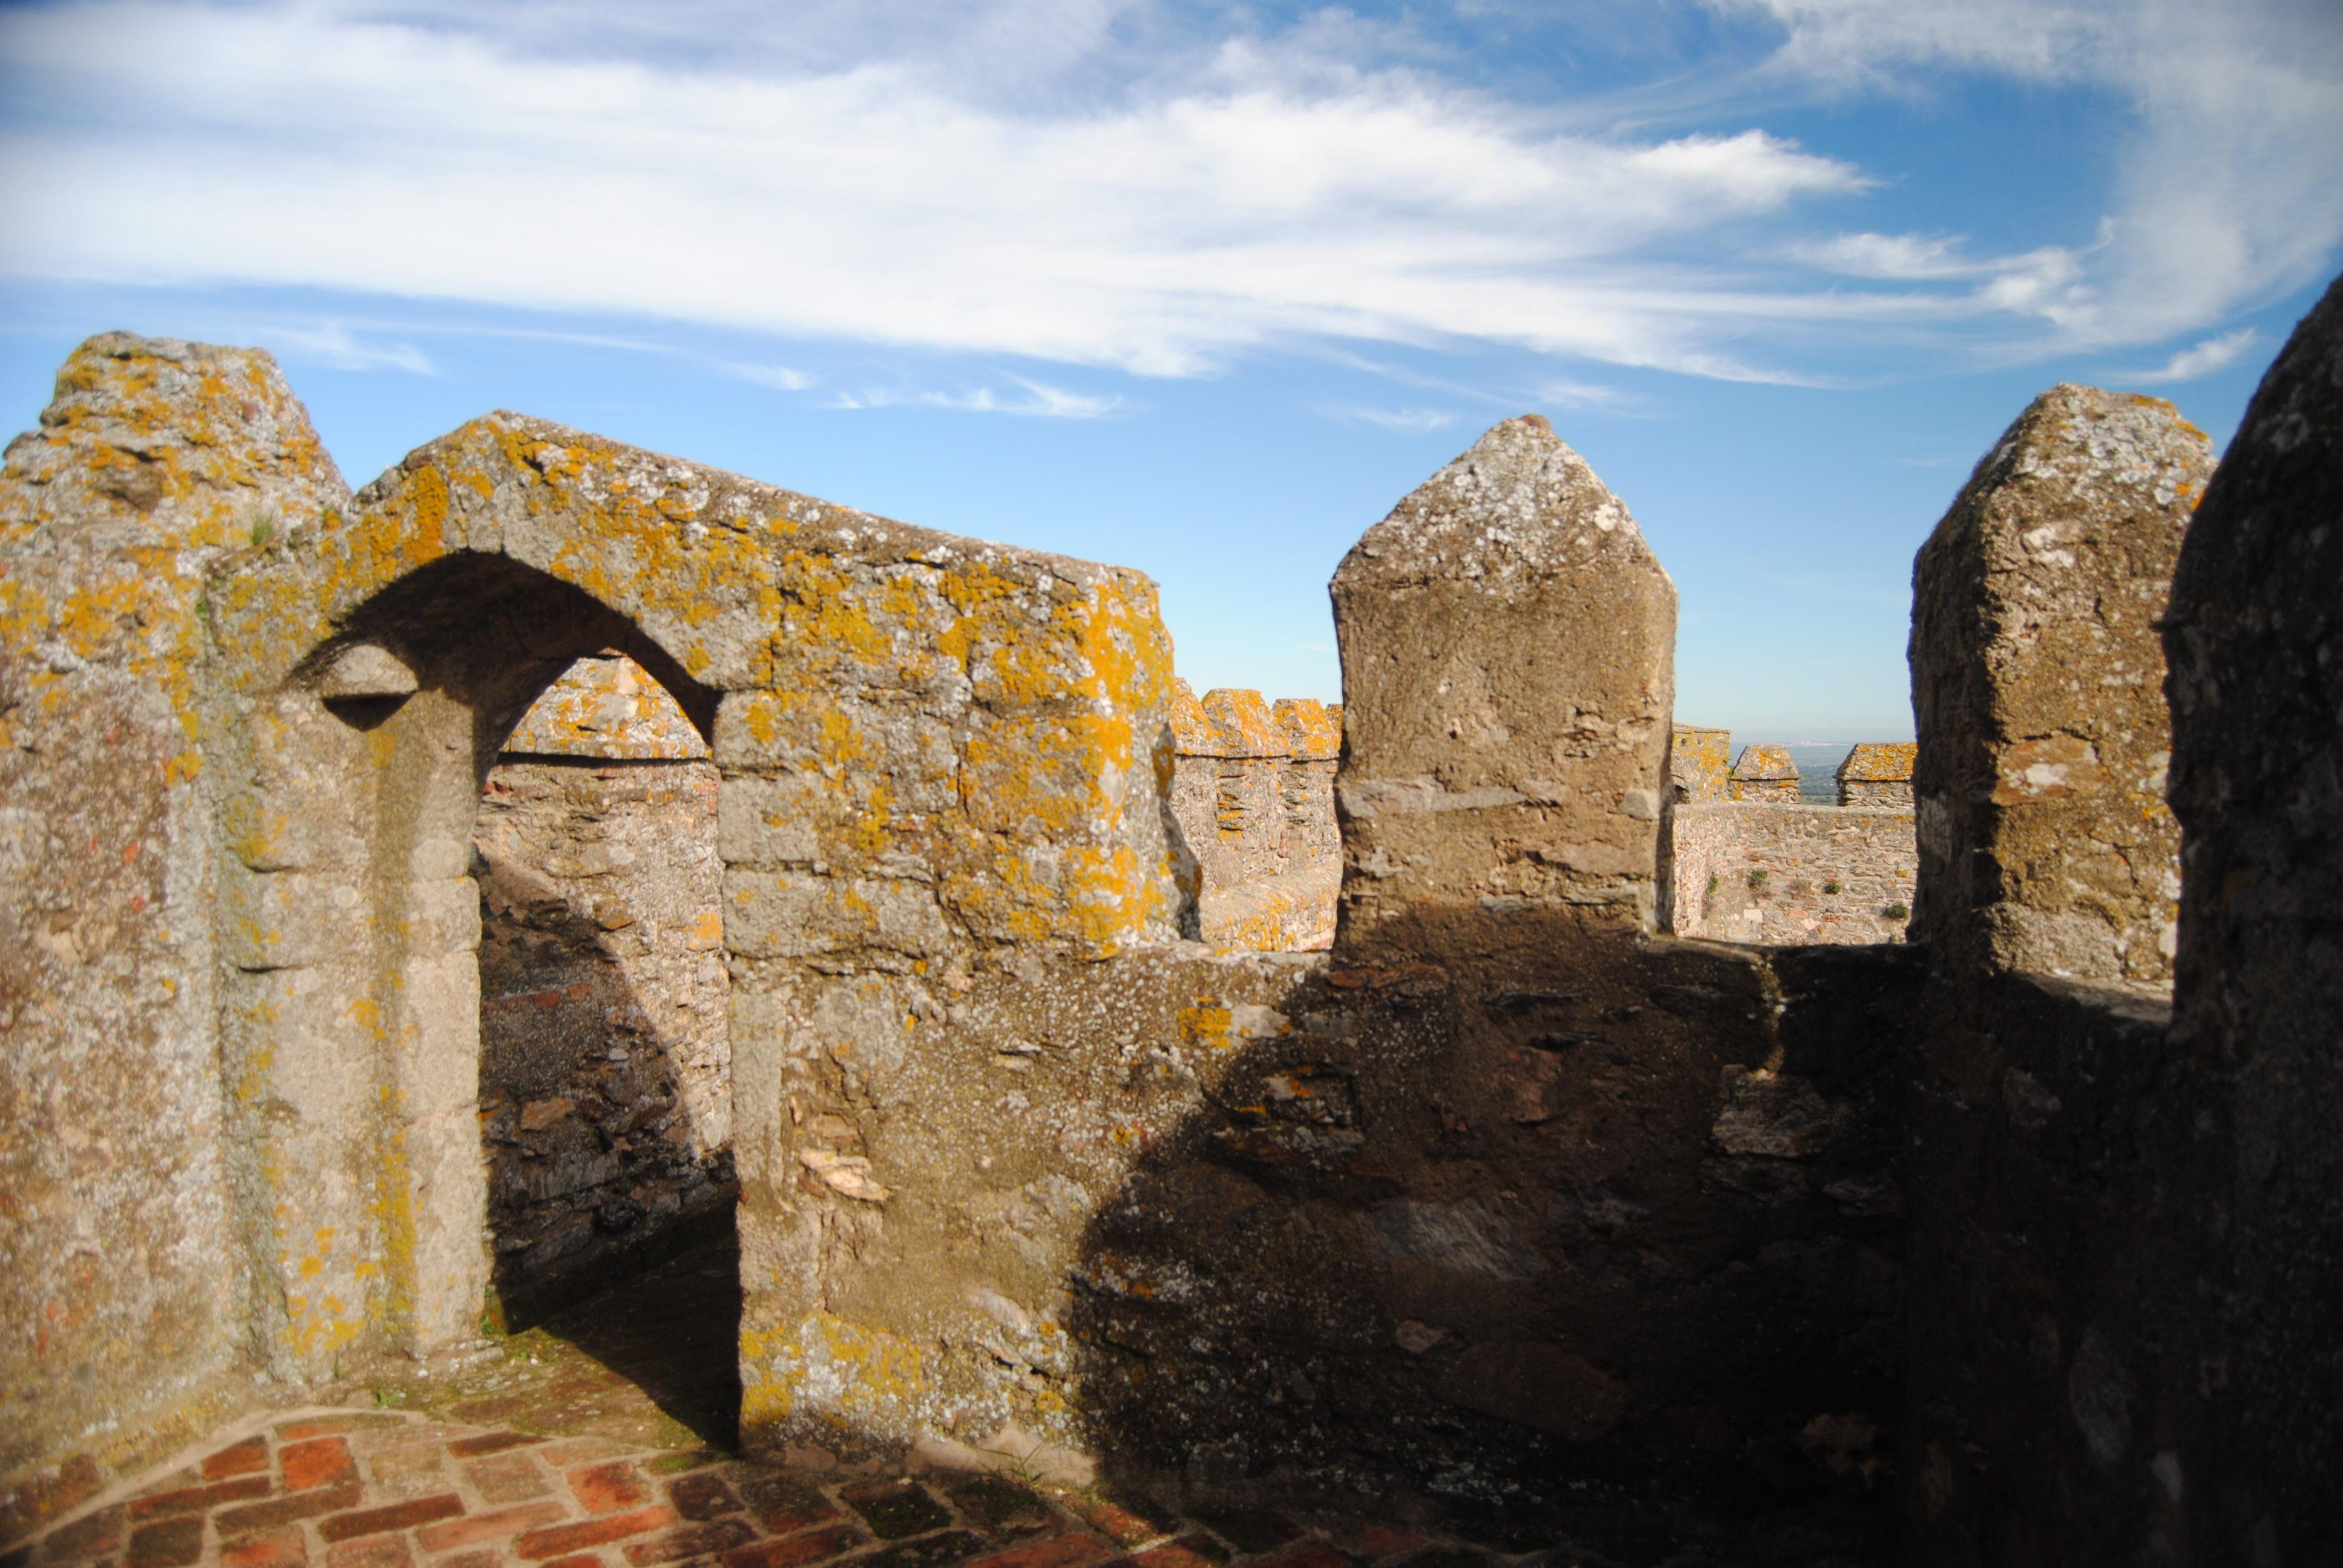 File:Castillo de Segura de León (16055765666).jpg - Wikimedia Commons